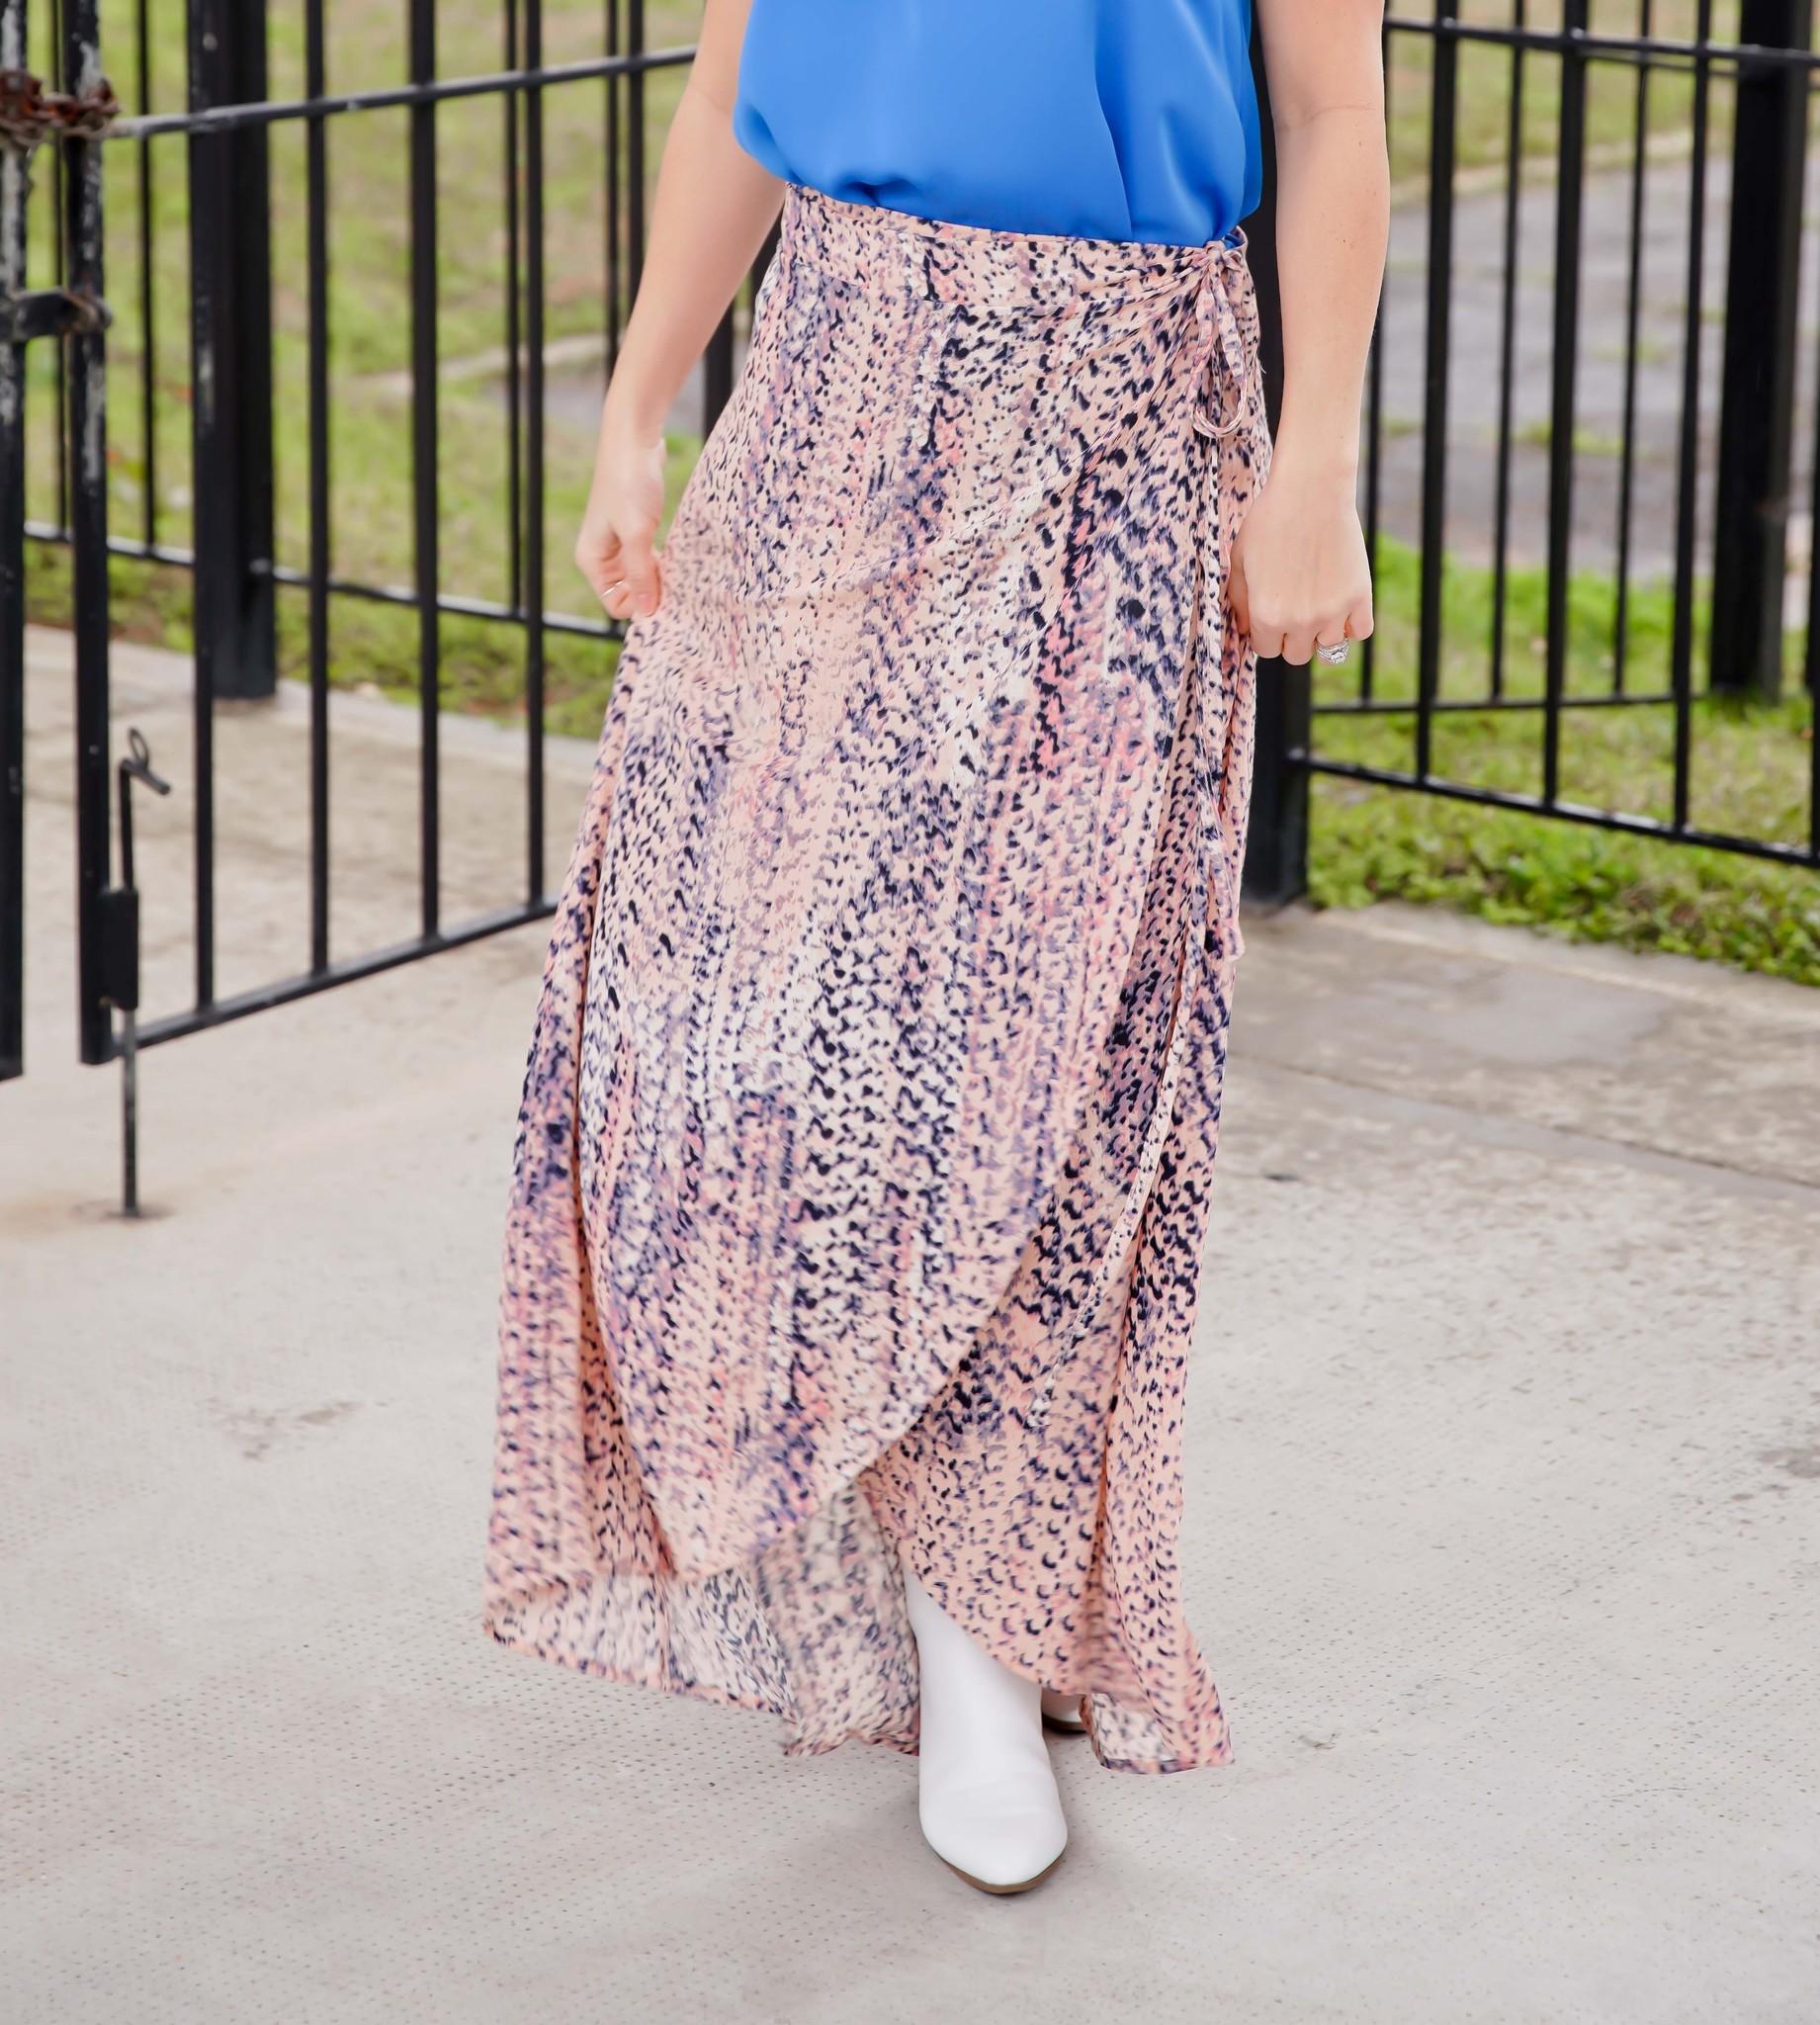 Ninexis Peach/Coral Wrap Maxi Skirt